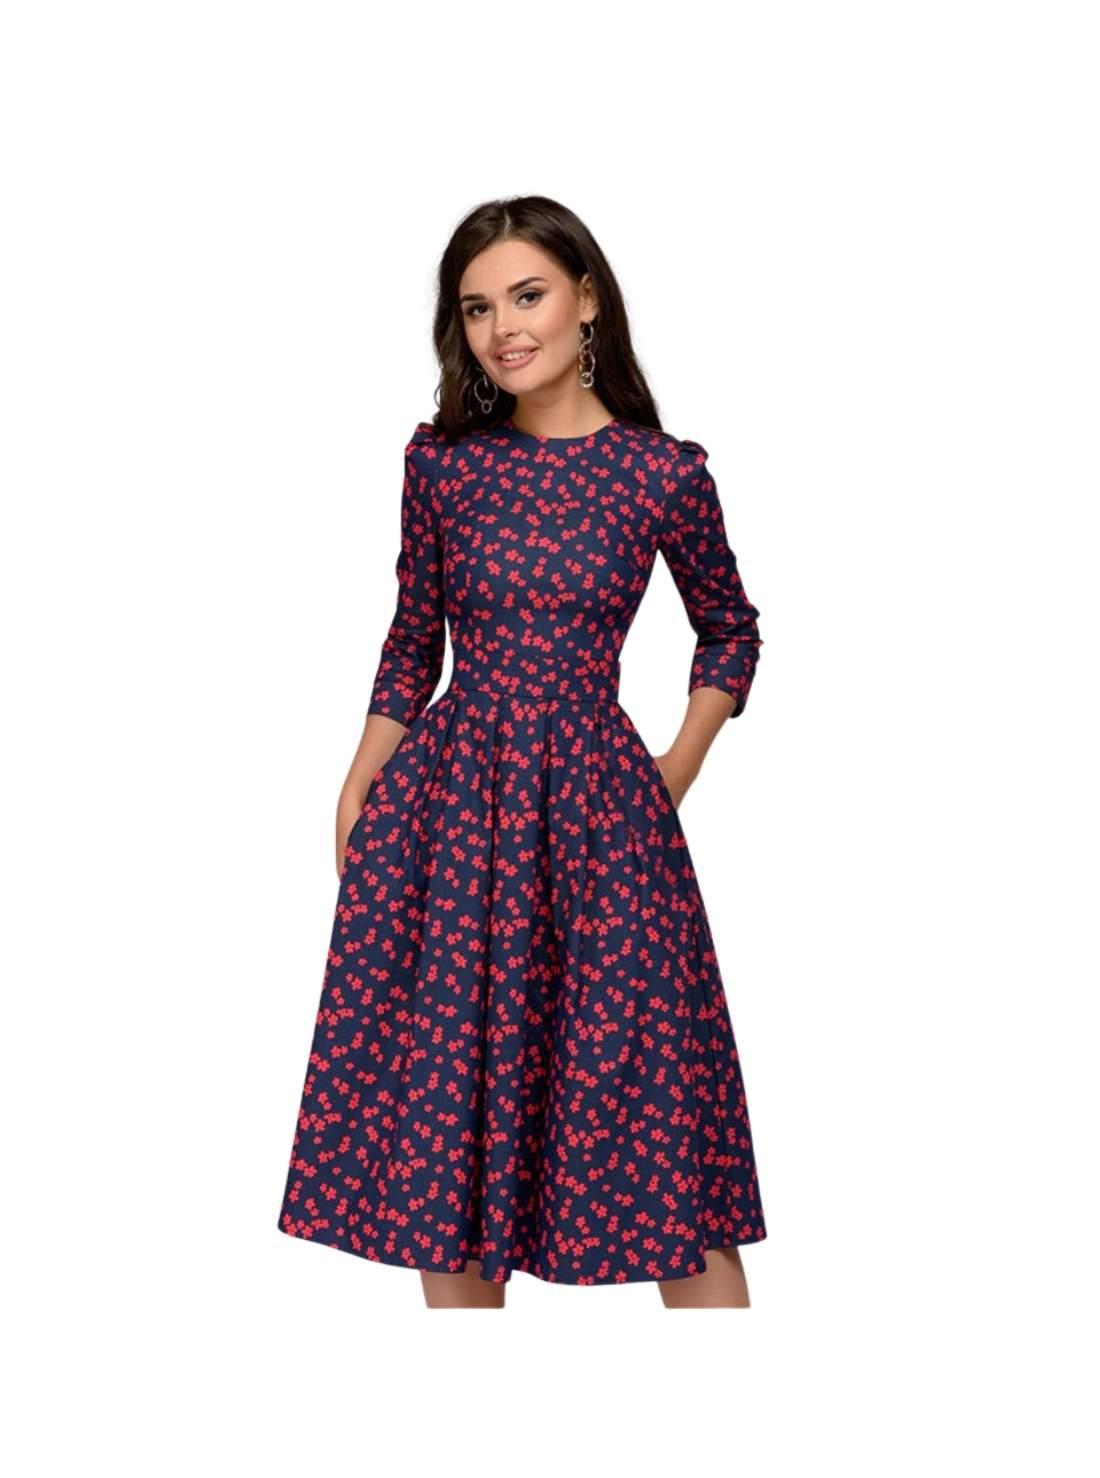 Wholesale Three Quarter Sleeve Floral Vintage Party Dresses